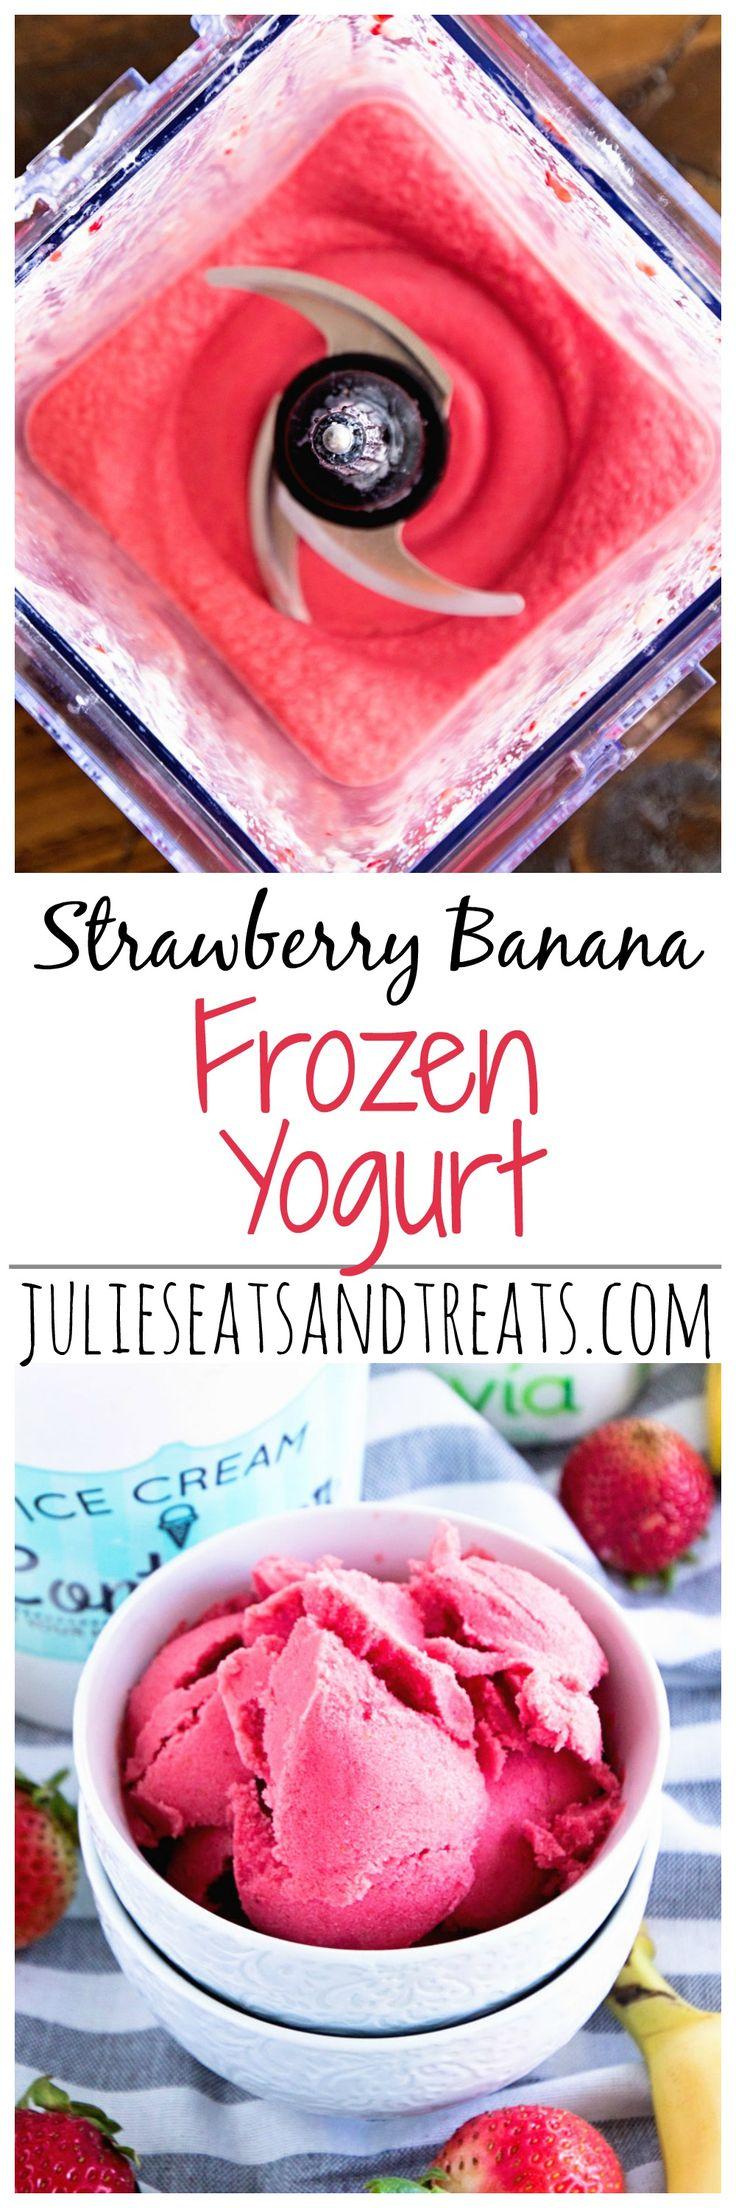 Strawberry Banana Frozen Yogurt ~ Light, Healthy Frozen Yogurt Recipe Loaded with Bananas and Strawberries! on MyRecipeMagic.com